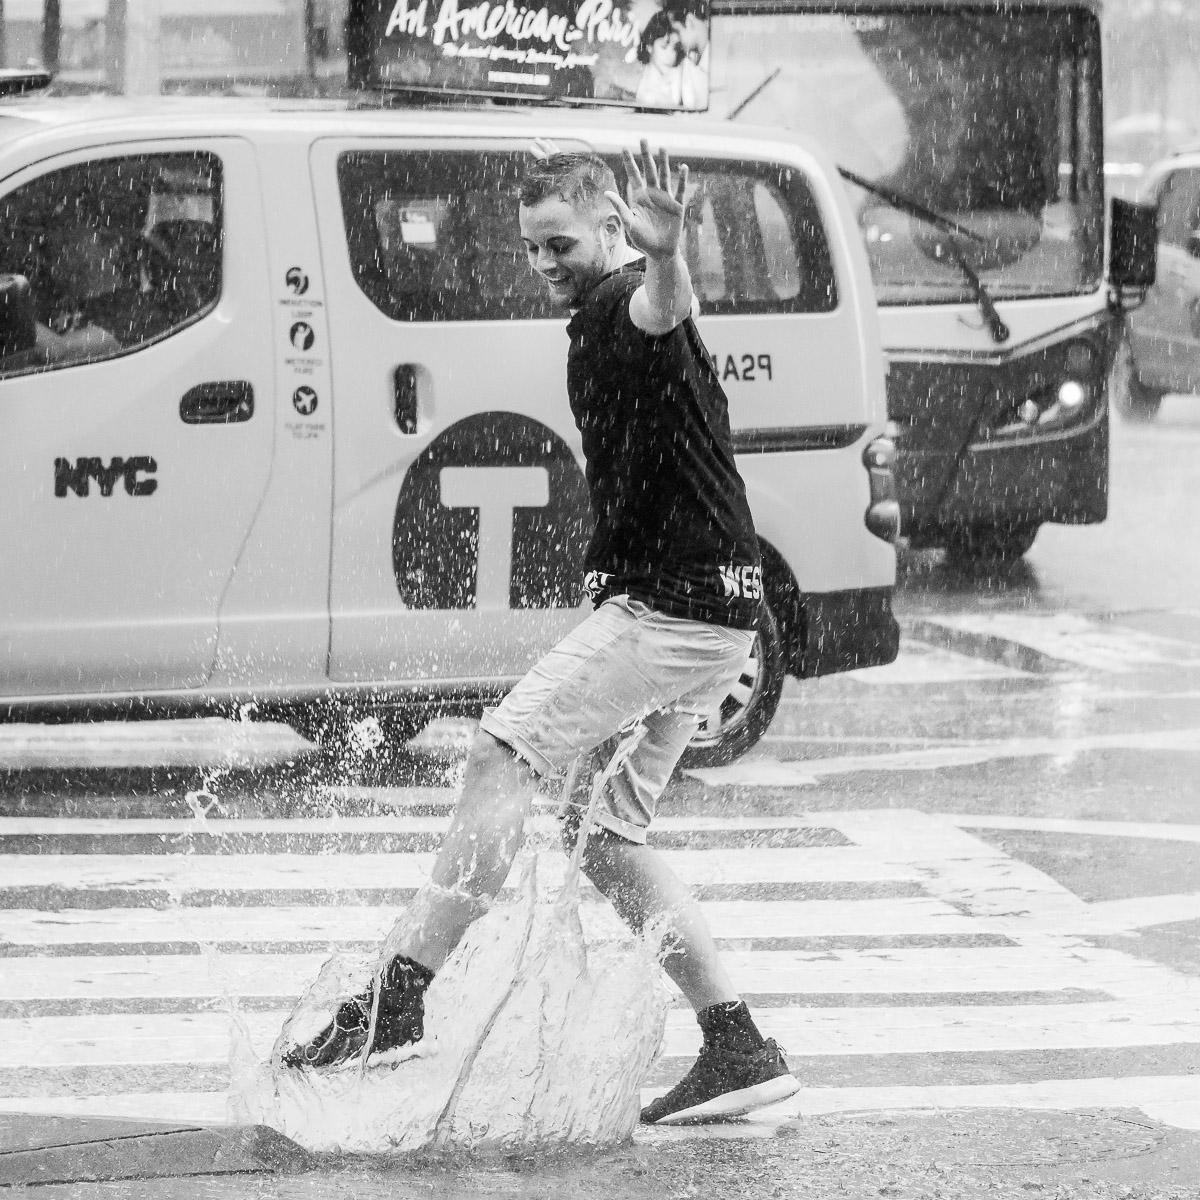 Dancing in the rain, New York